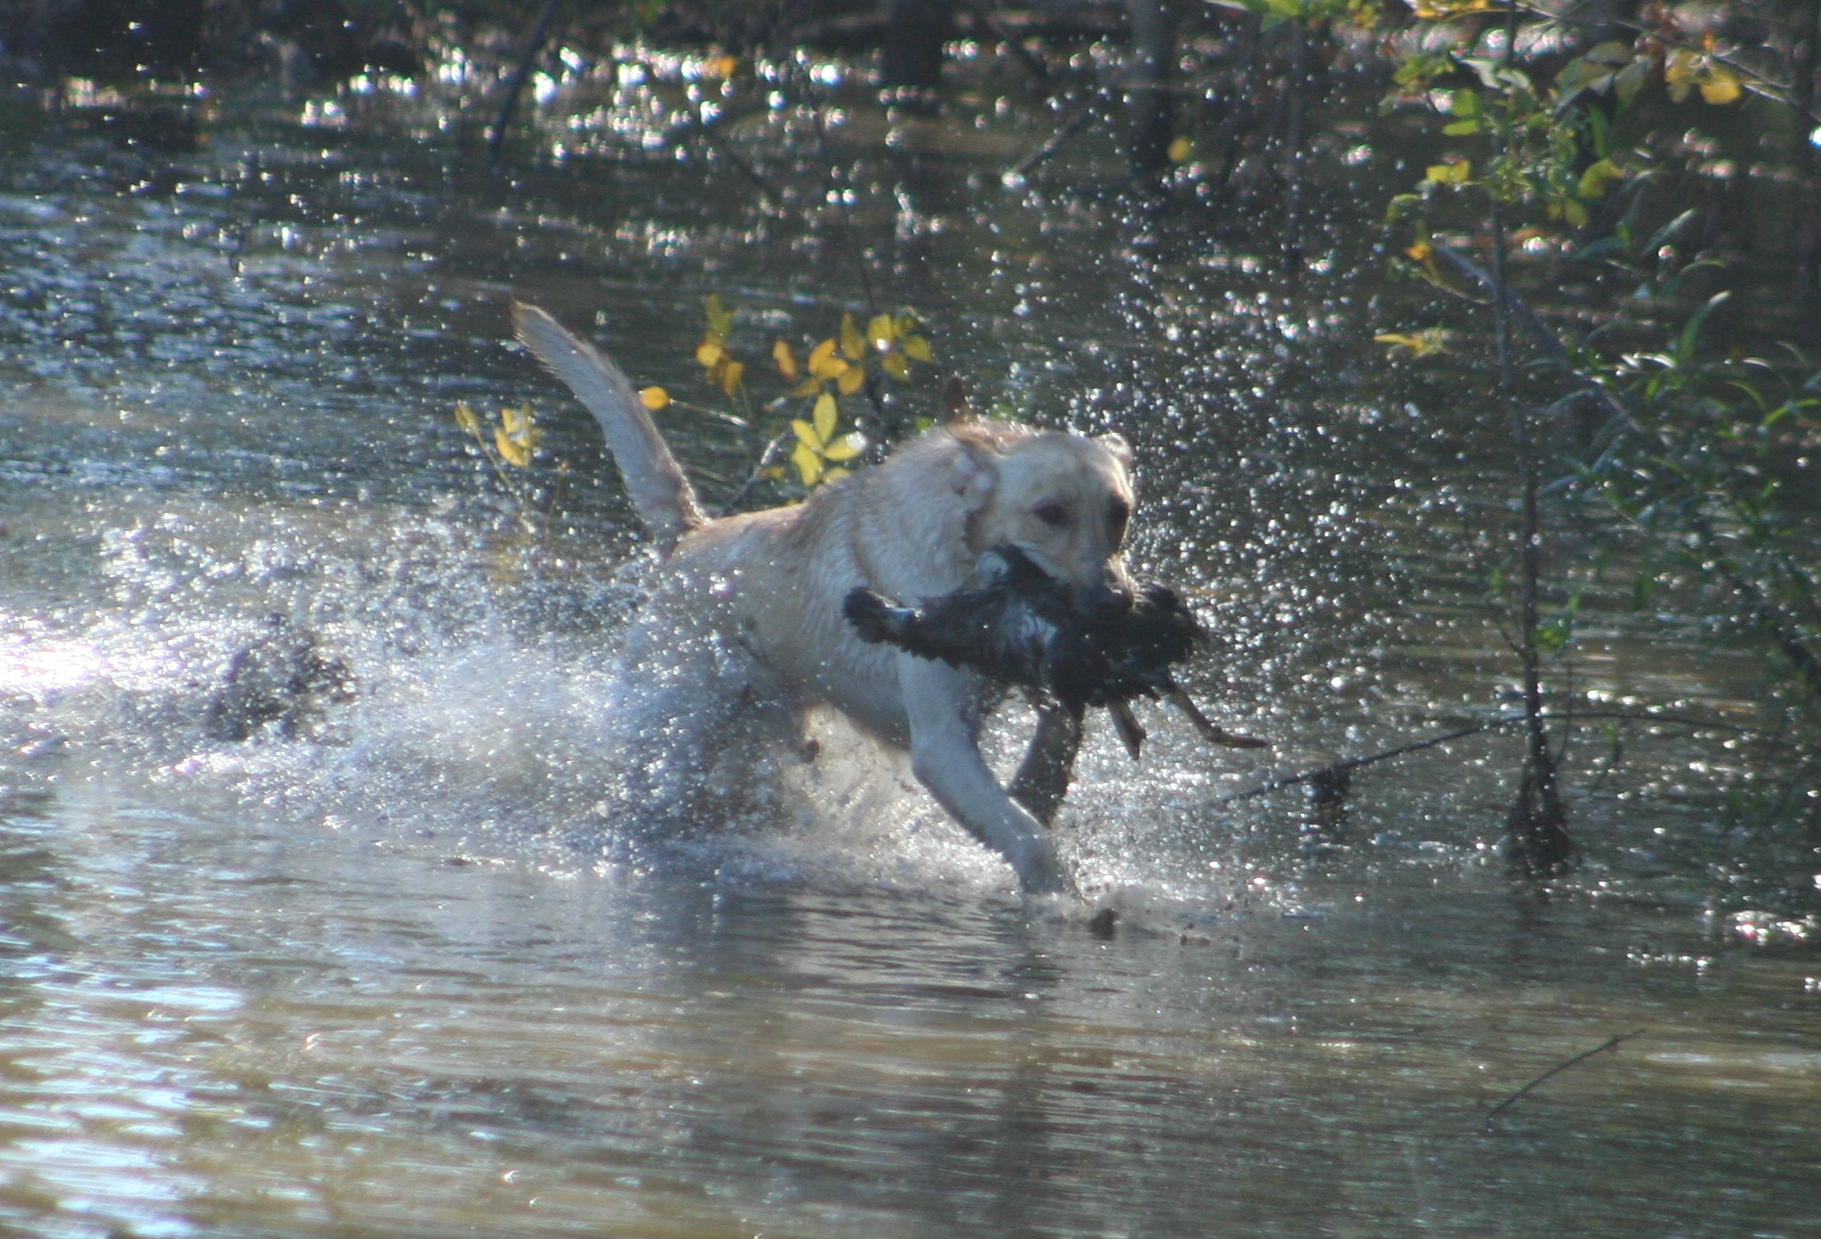 water dog.JPG